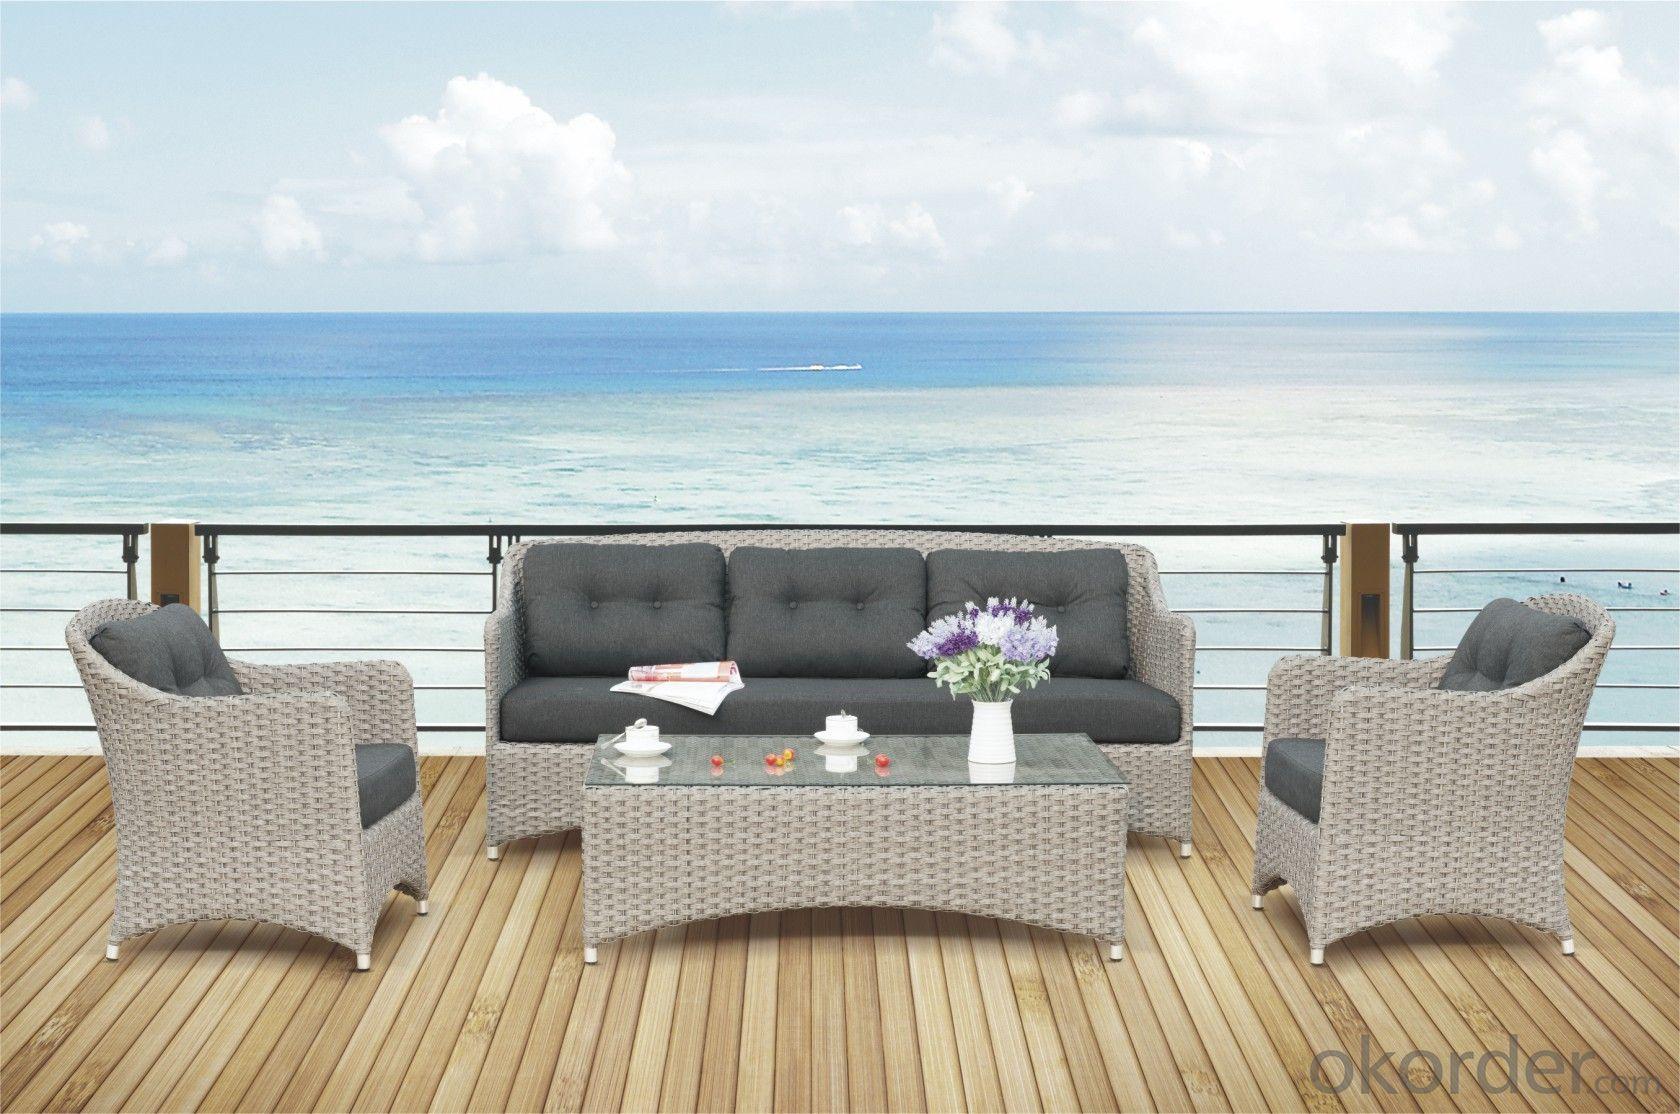 Garden Sofa PE Rattan with Aluminum Frame  CMAX-YT011